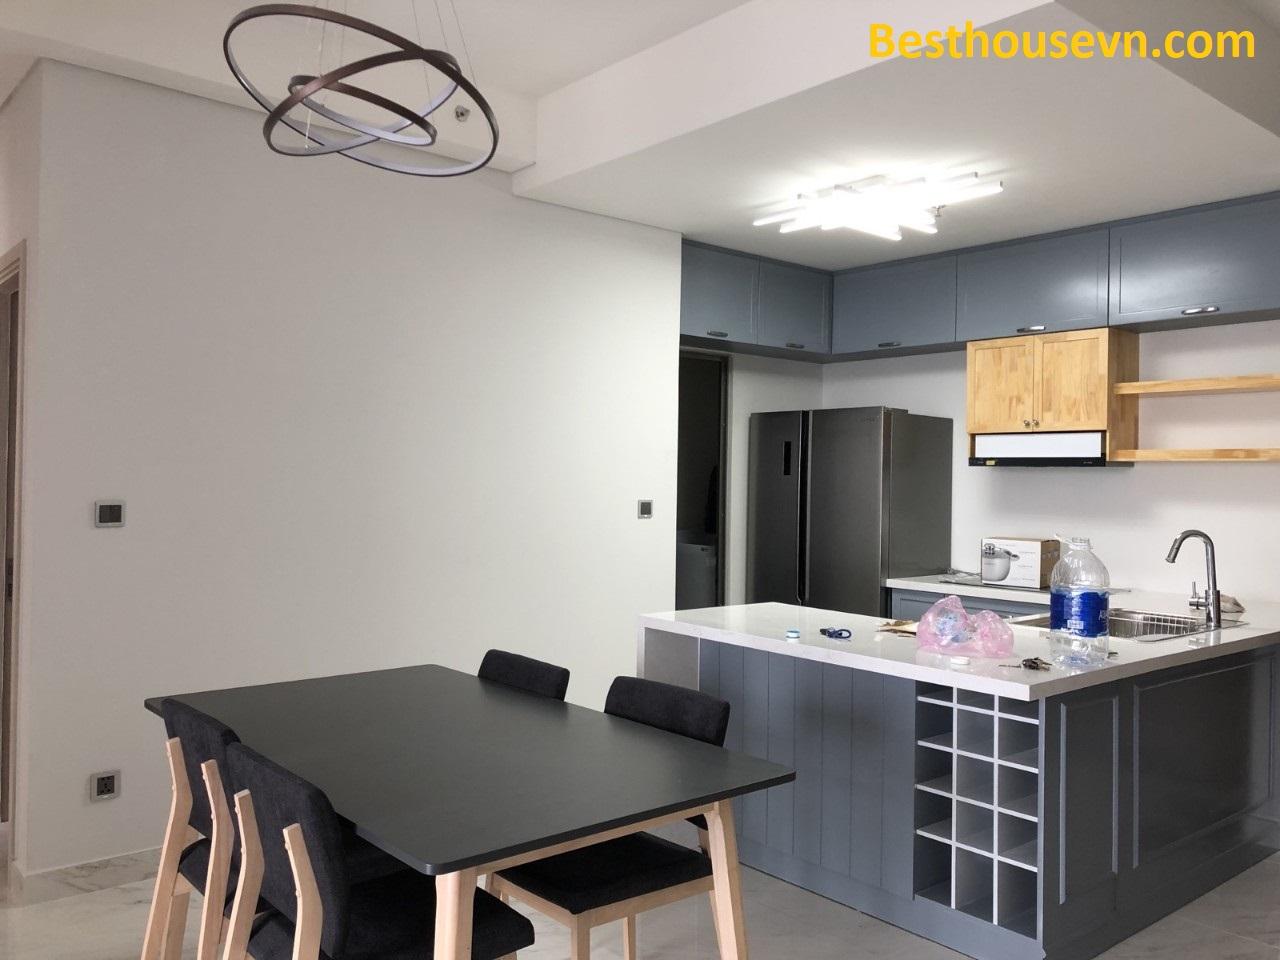 No-option-kitchen-area